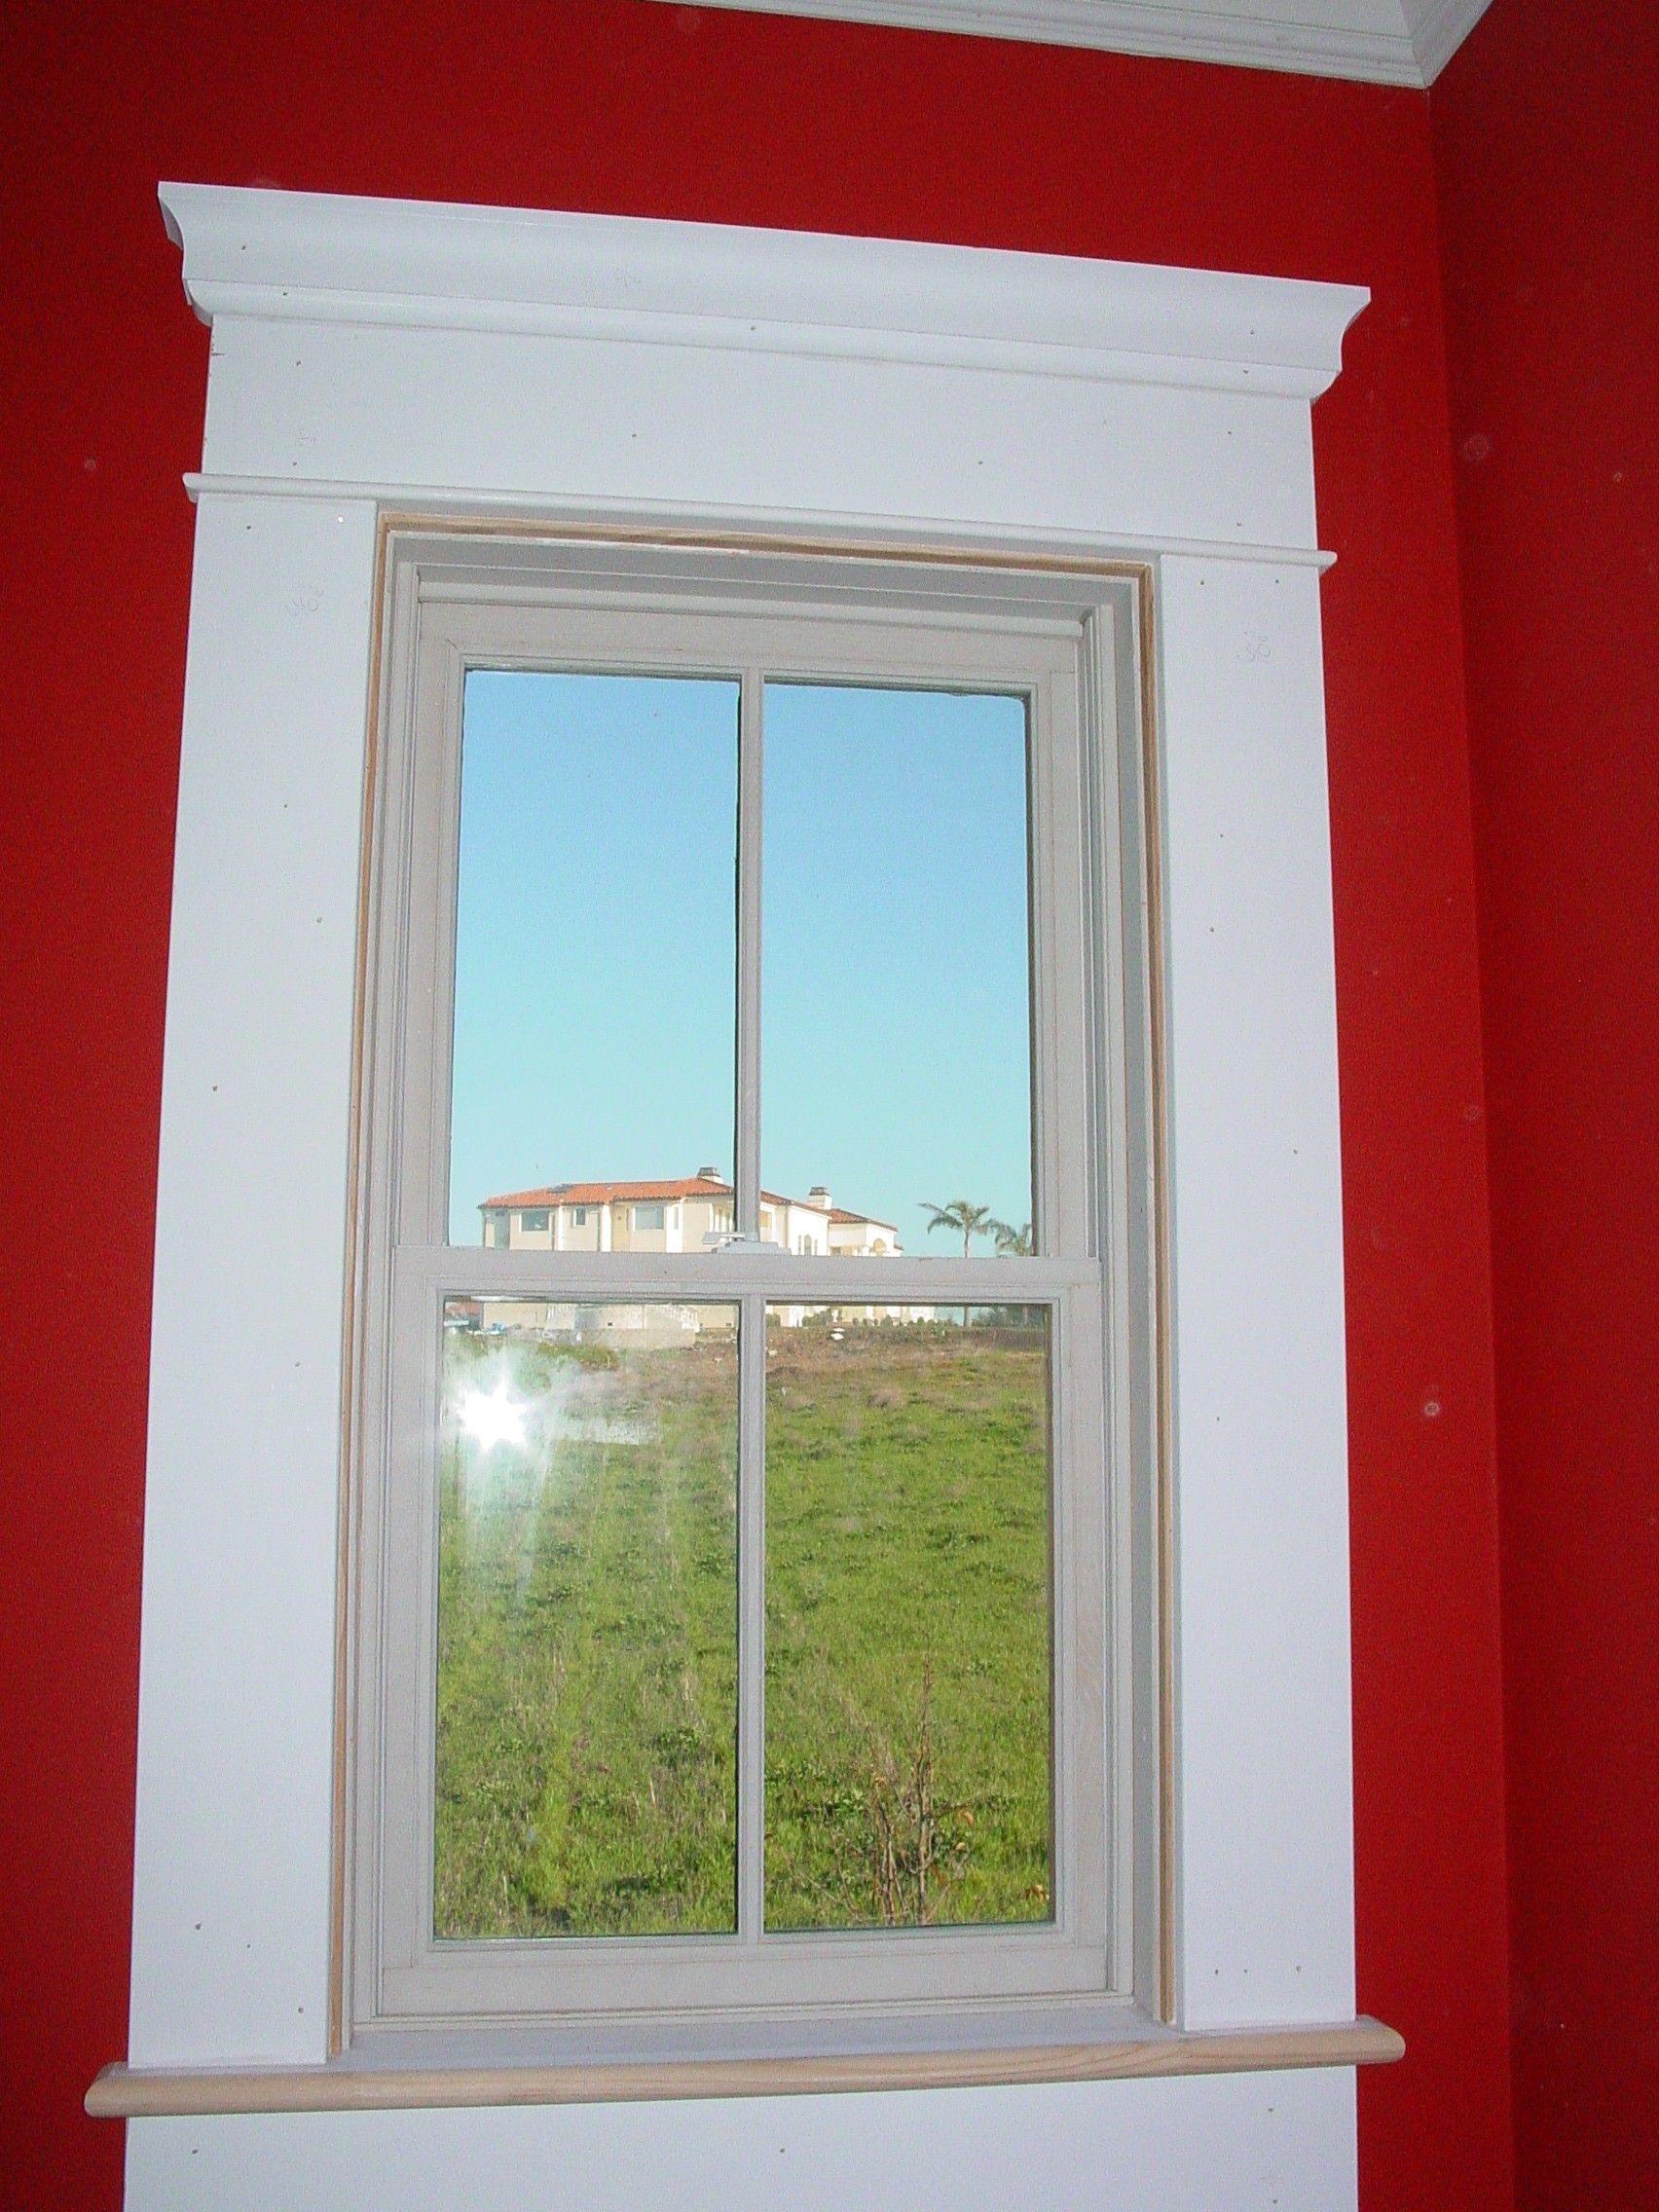 Window casing ideas  trim ideas for exterior doors and windows  joy studio design